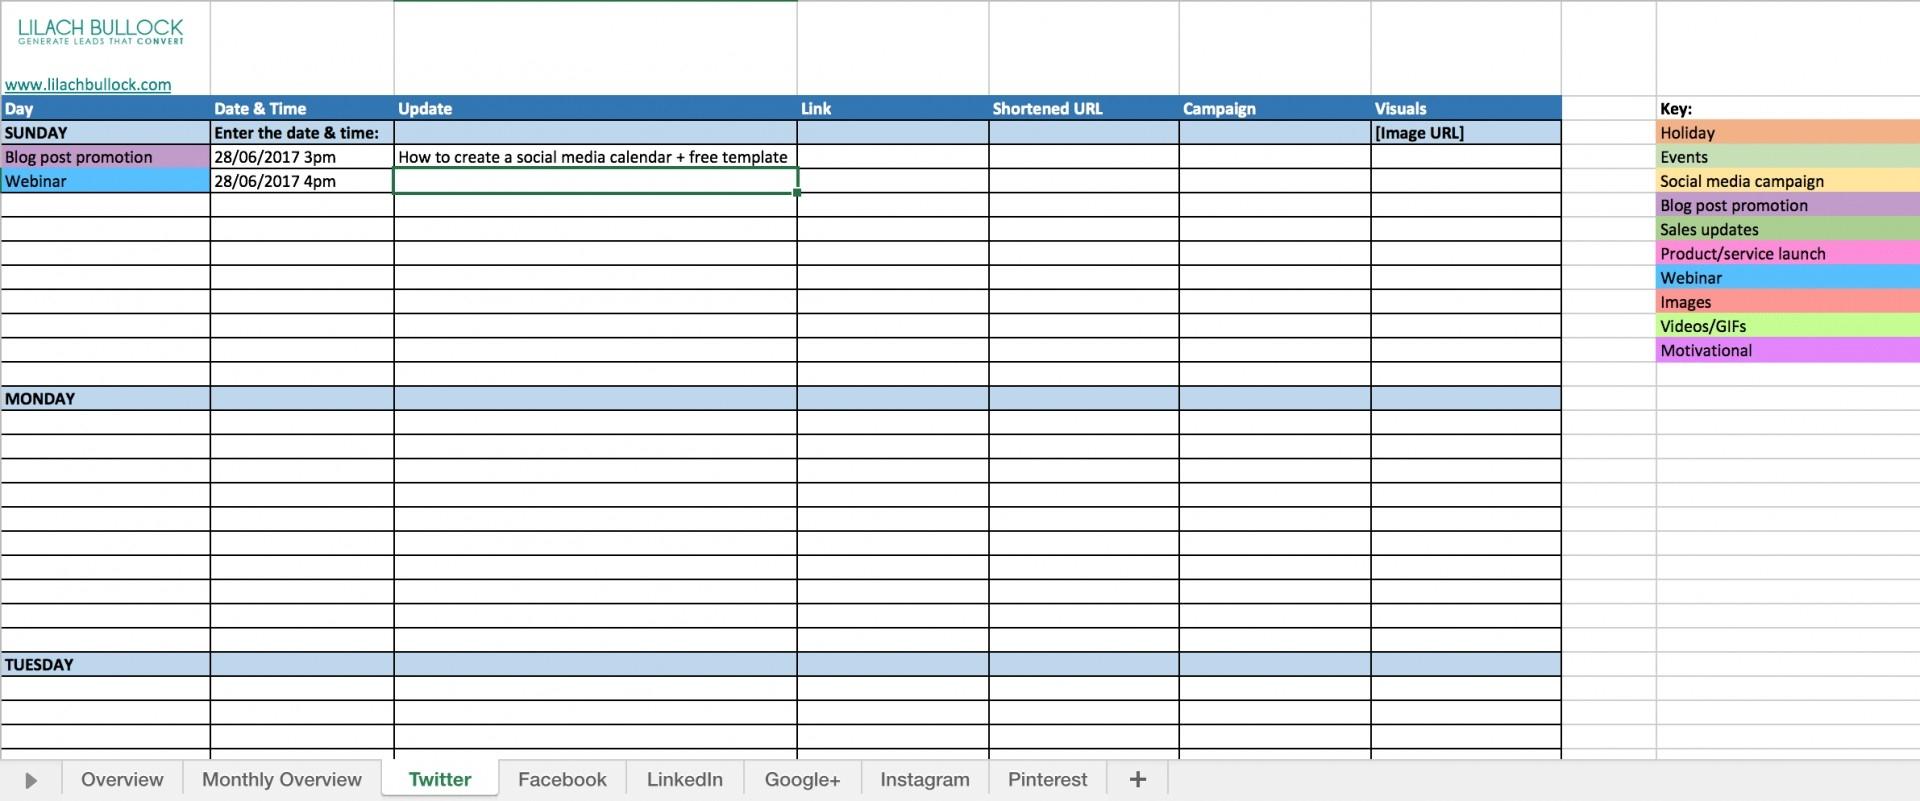 020 Social Media Marketing Calendar Content Template Amazing-Blog Post Schedule Template 2020